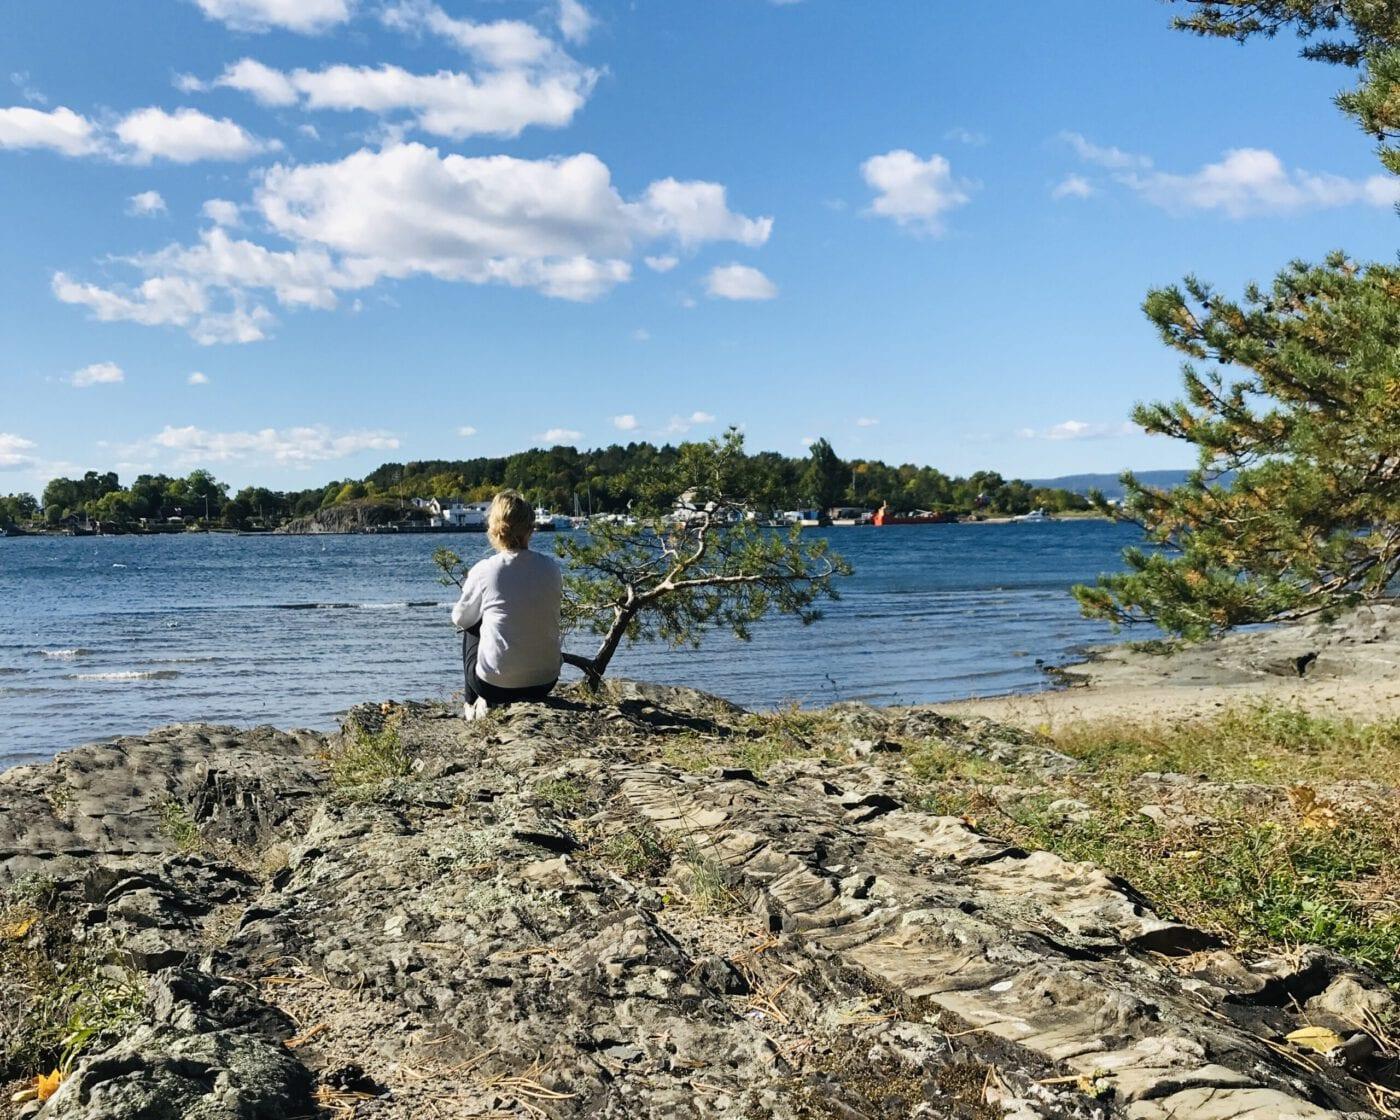 Neuanfang während Corona: Mein Umzug nach Oslo